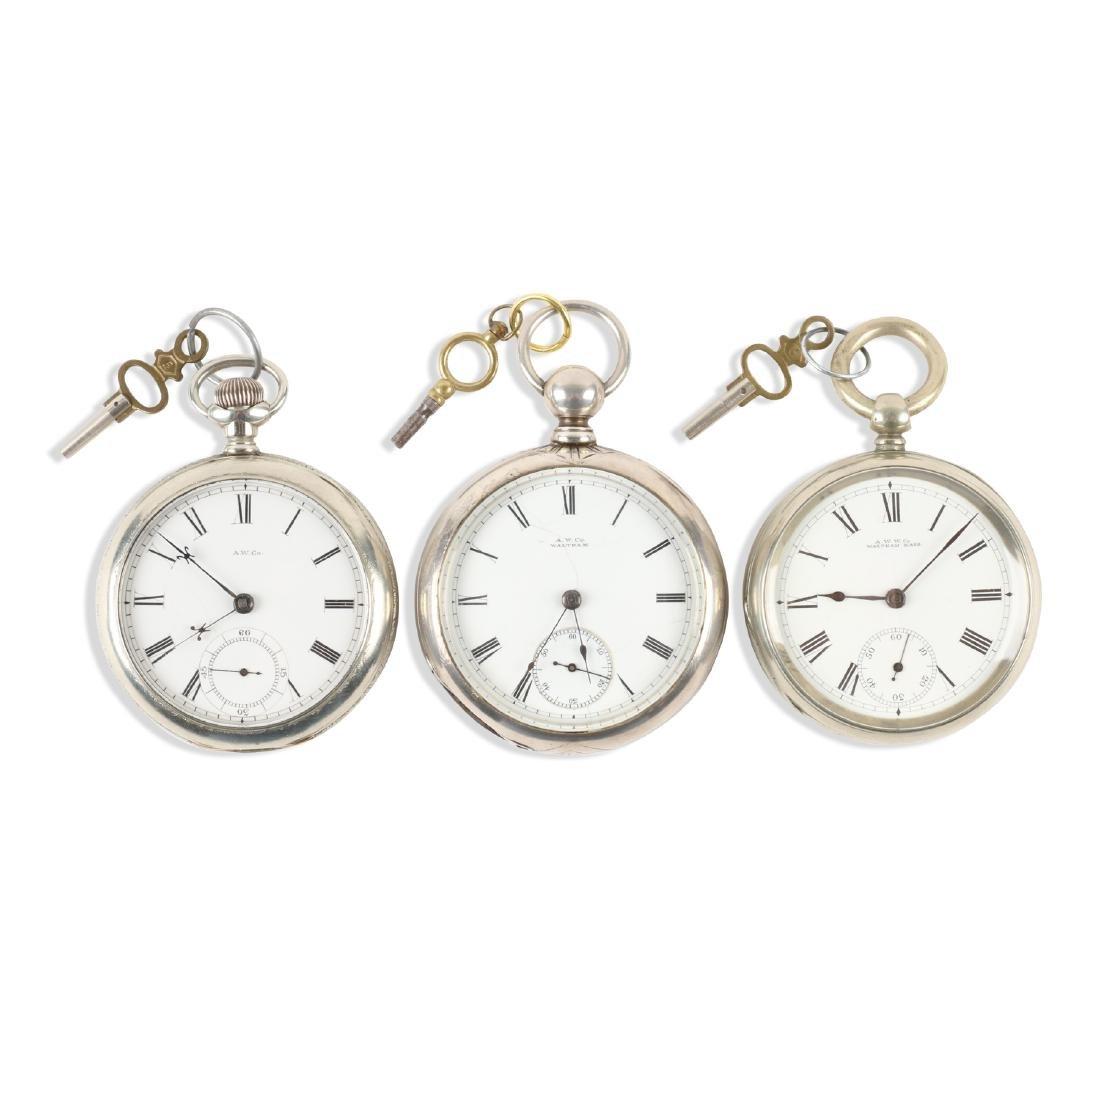 Waltham, Early Key Wind Pocket Watches